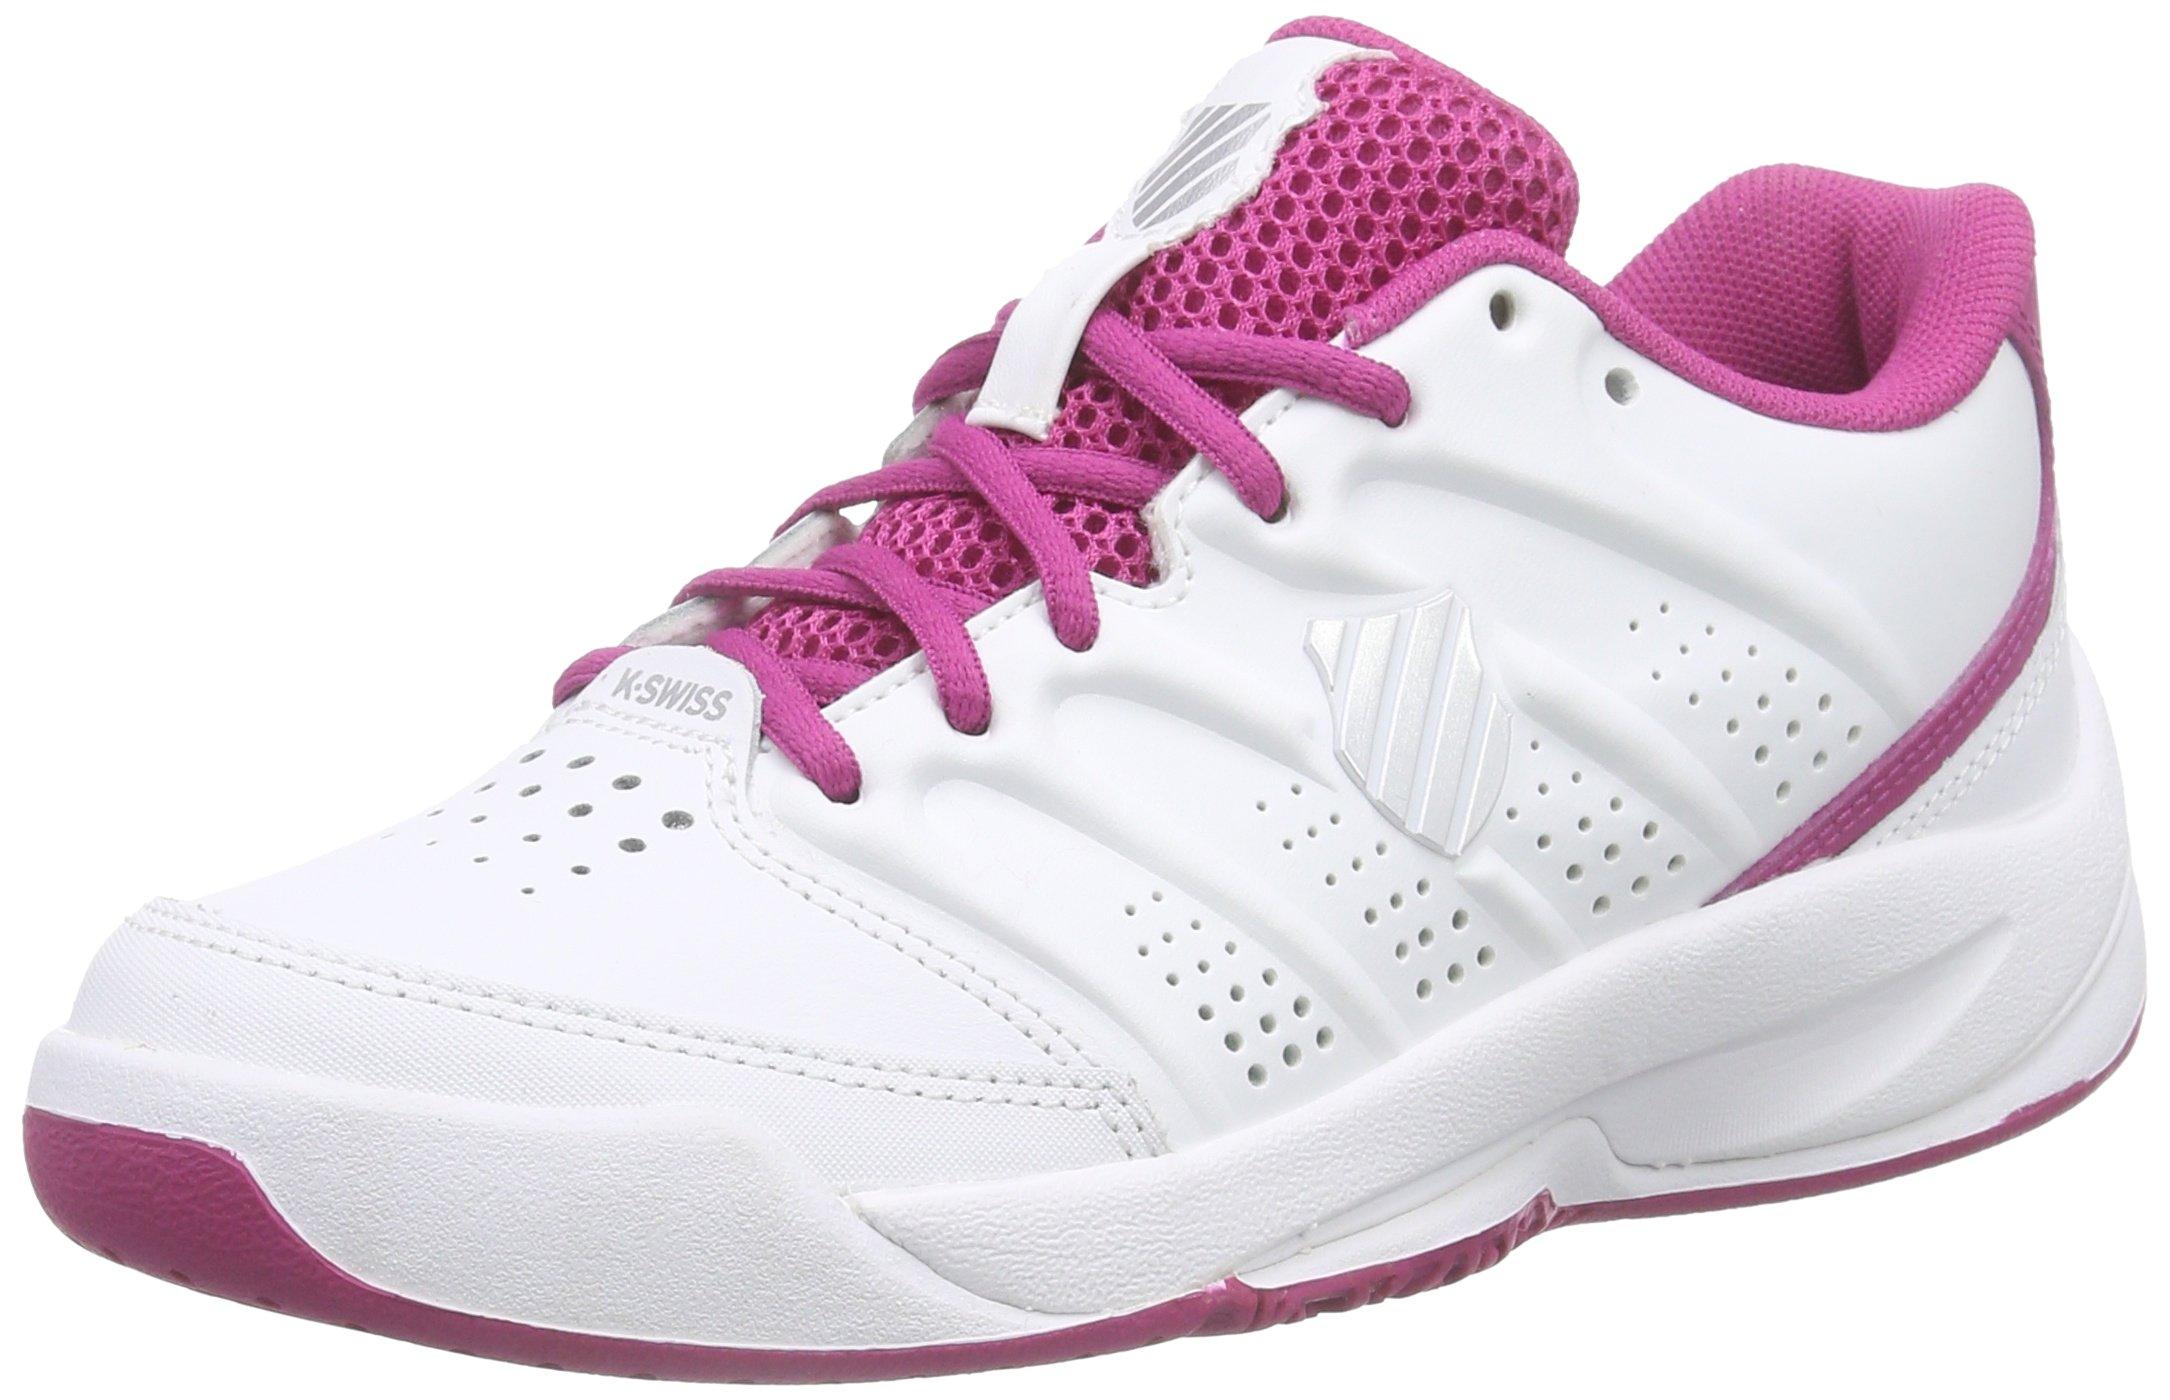 K-Swiss Ultrascendor Omni Junior Tennis Shoes, White, US10.5